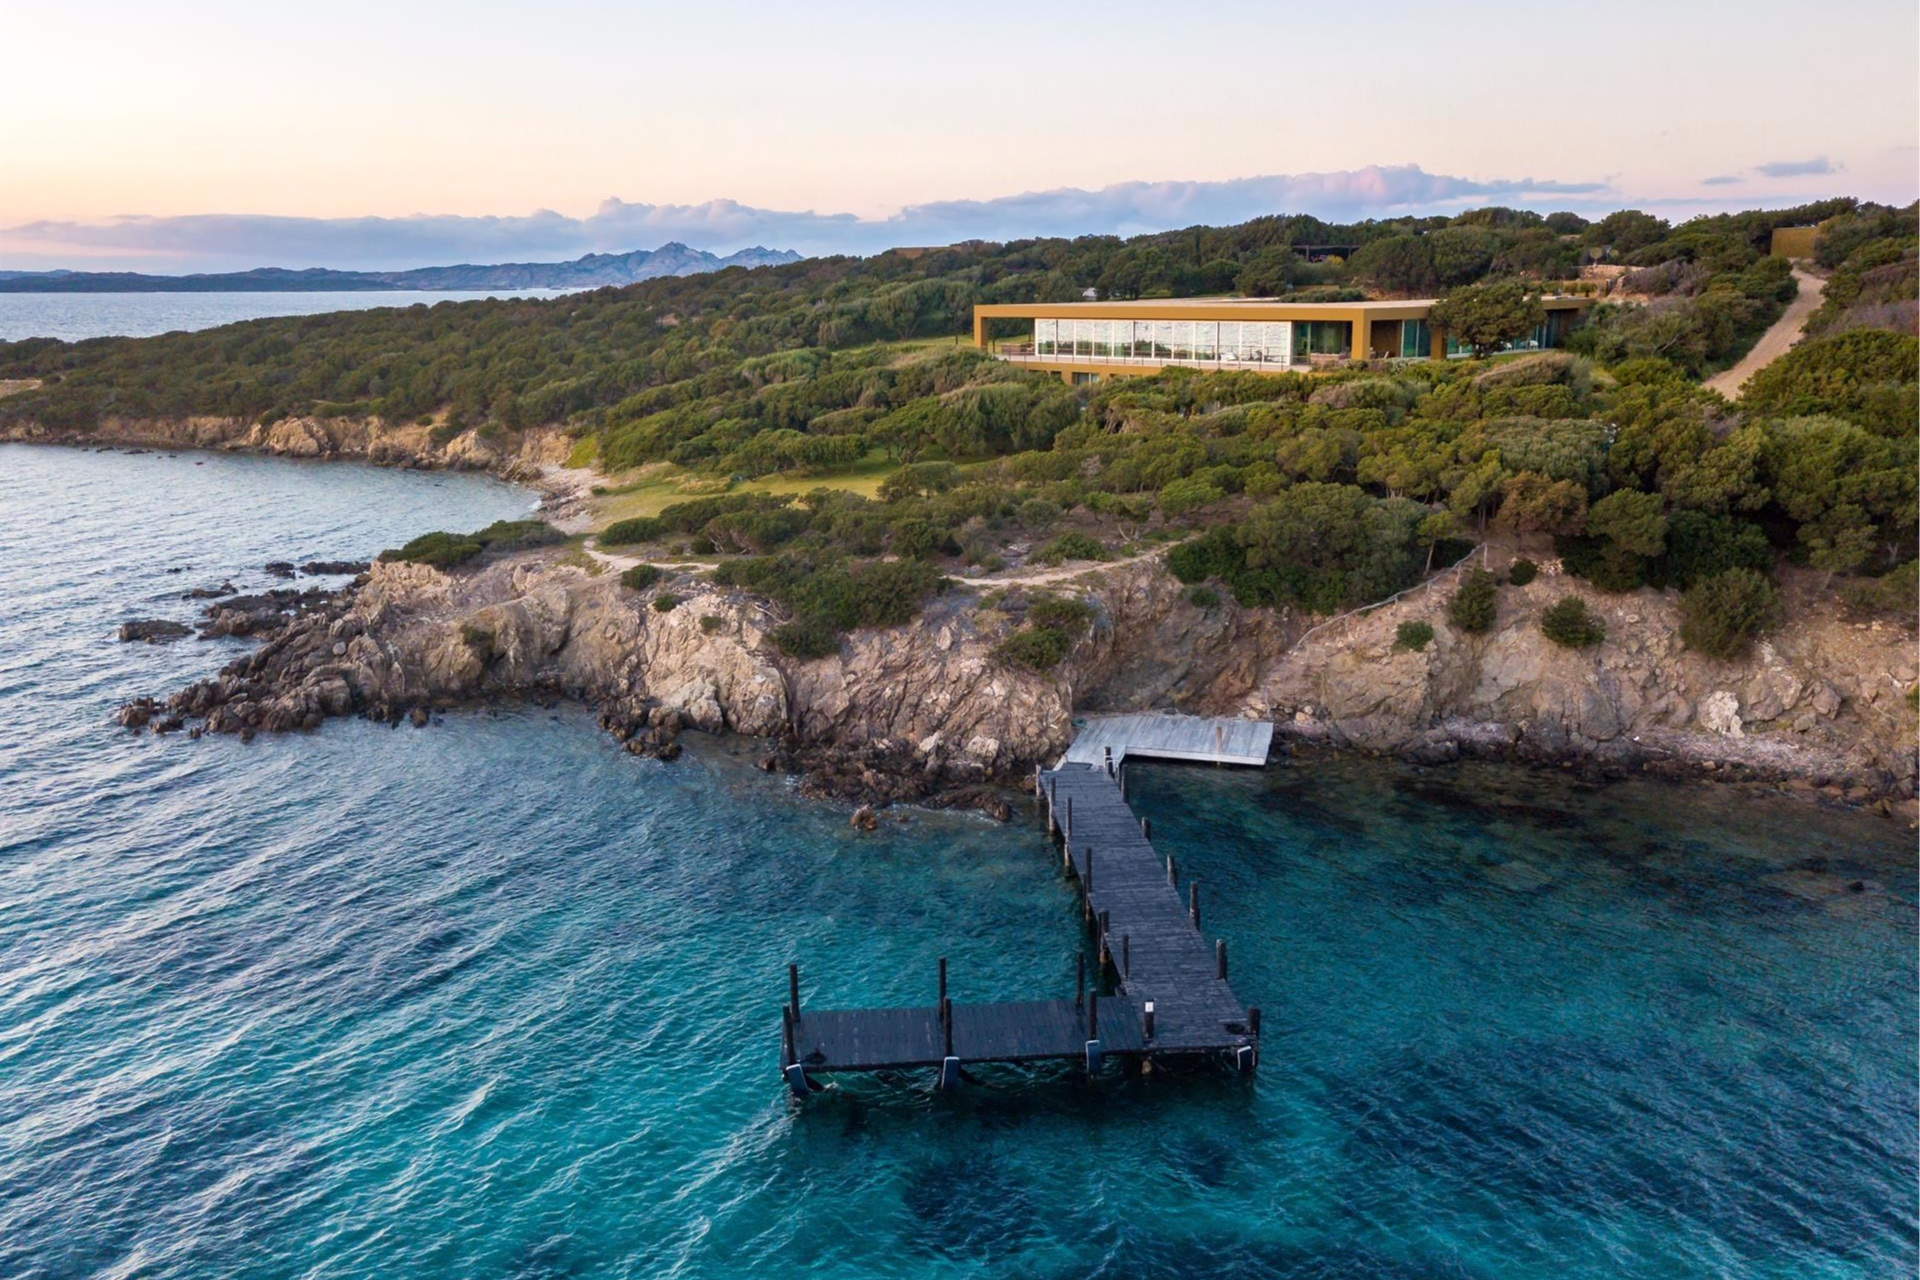 Villa, Cap d'Antibes - Côte d'Azur, South of France